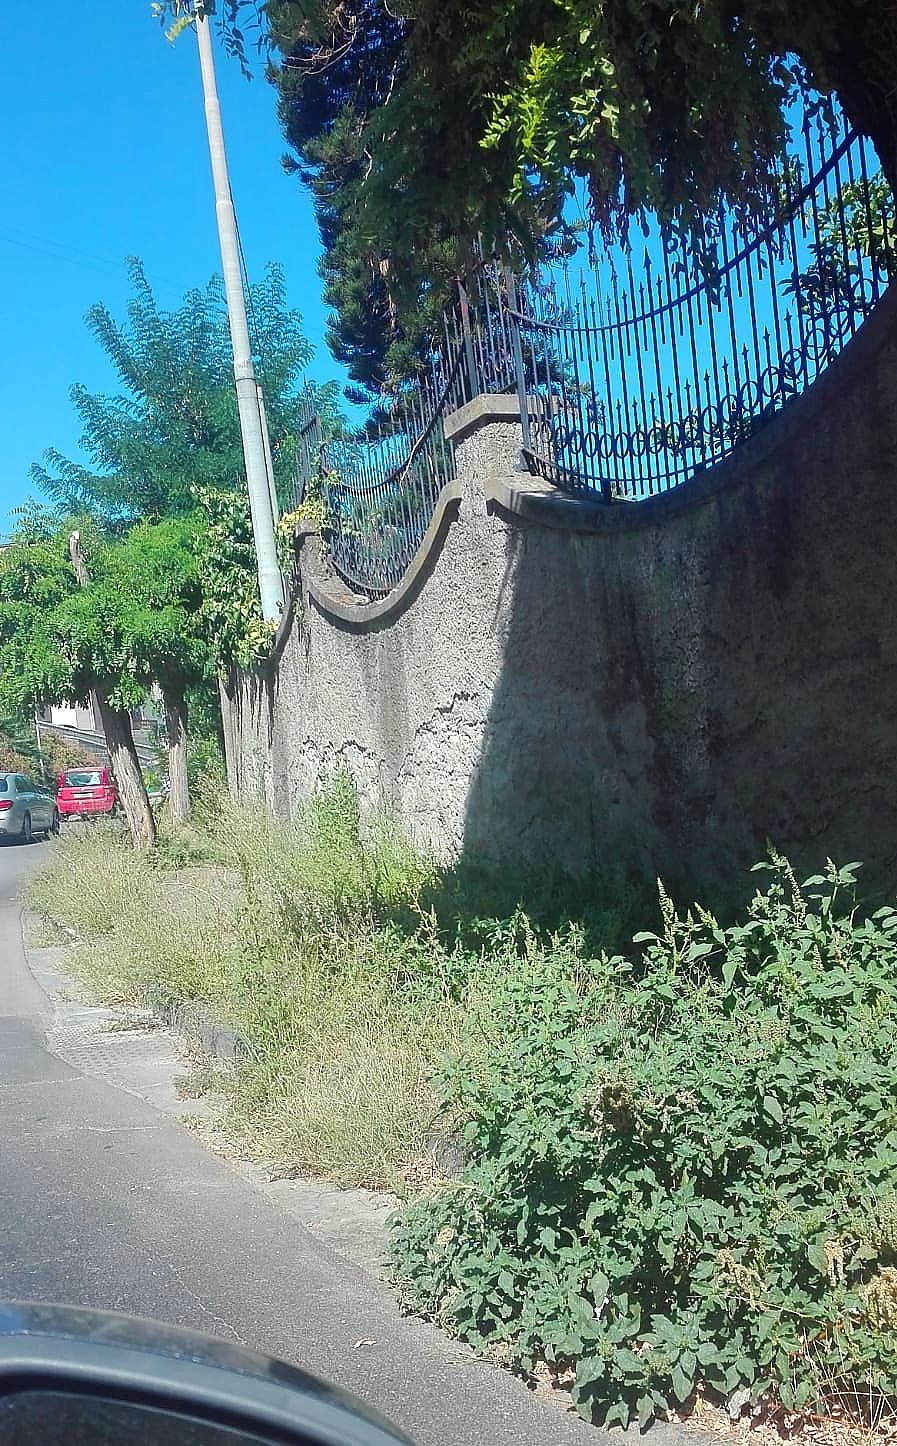 Incuria ai marciapiedi stradali - Via Panoramica (foto Raffaele Scala)